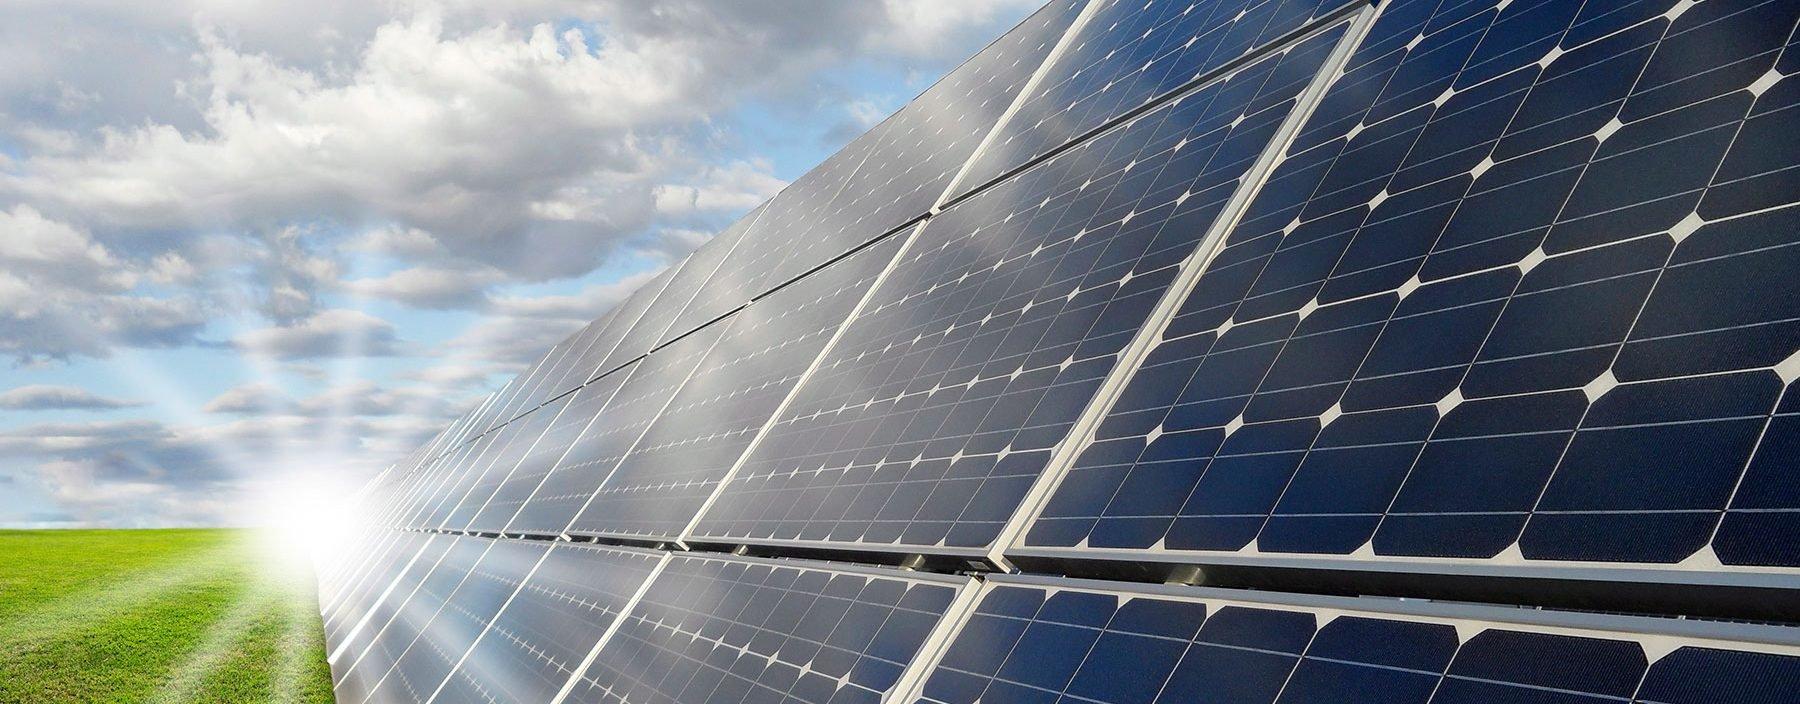 Solary radom